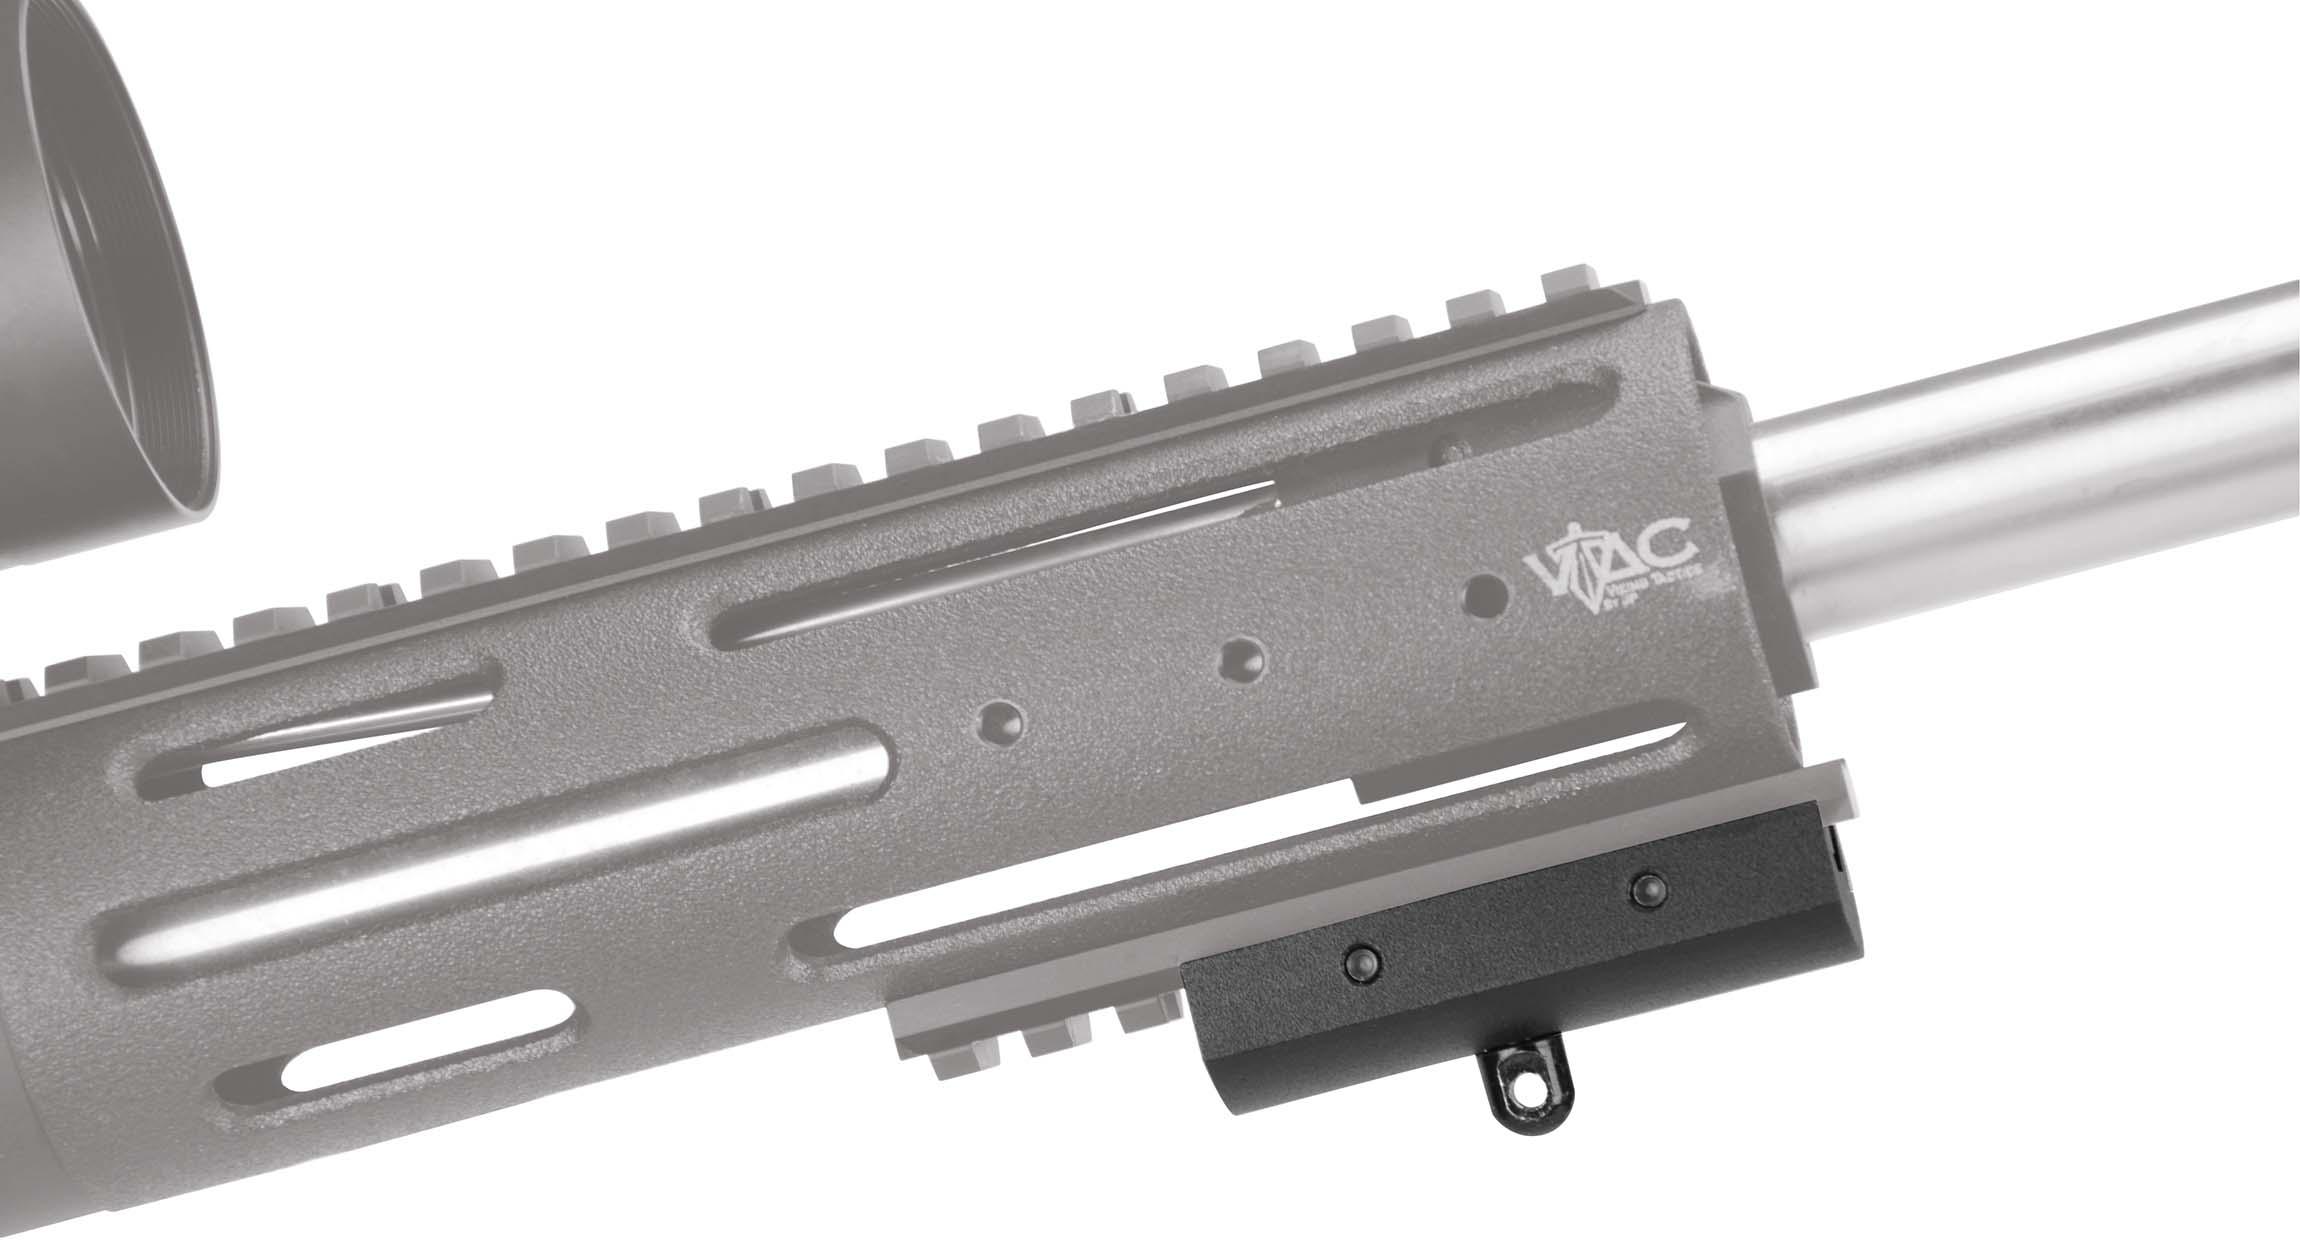 Bipod Adaptor for Picatinney Rail - 535423 gun side ghost